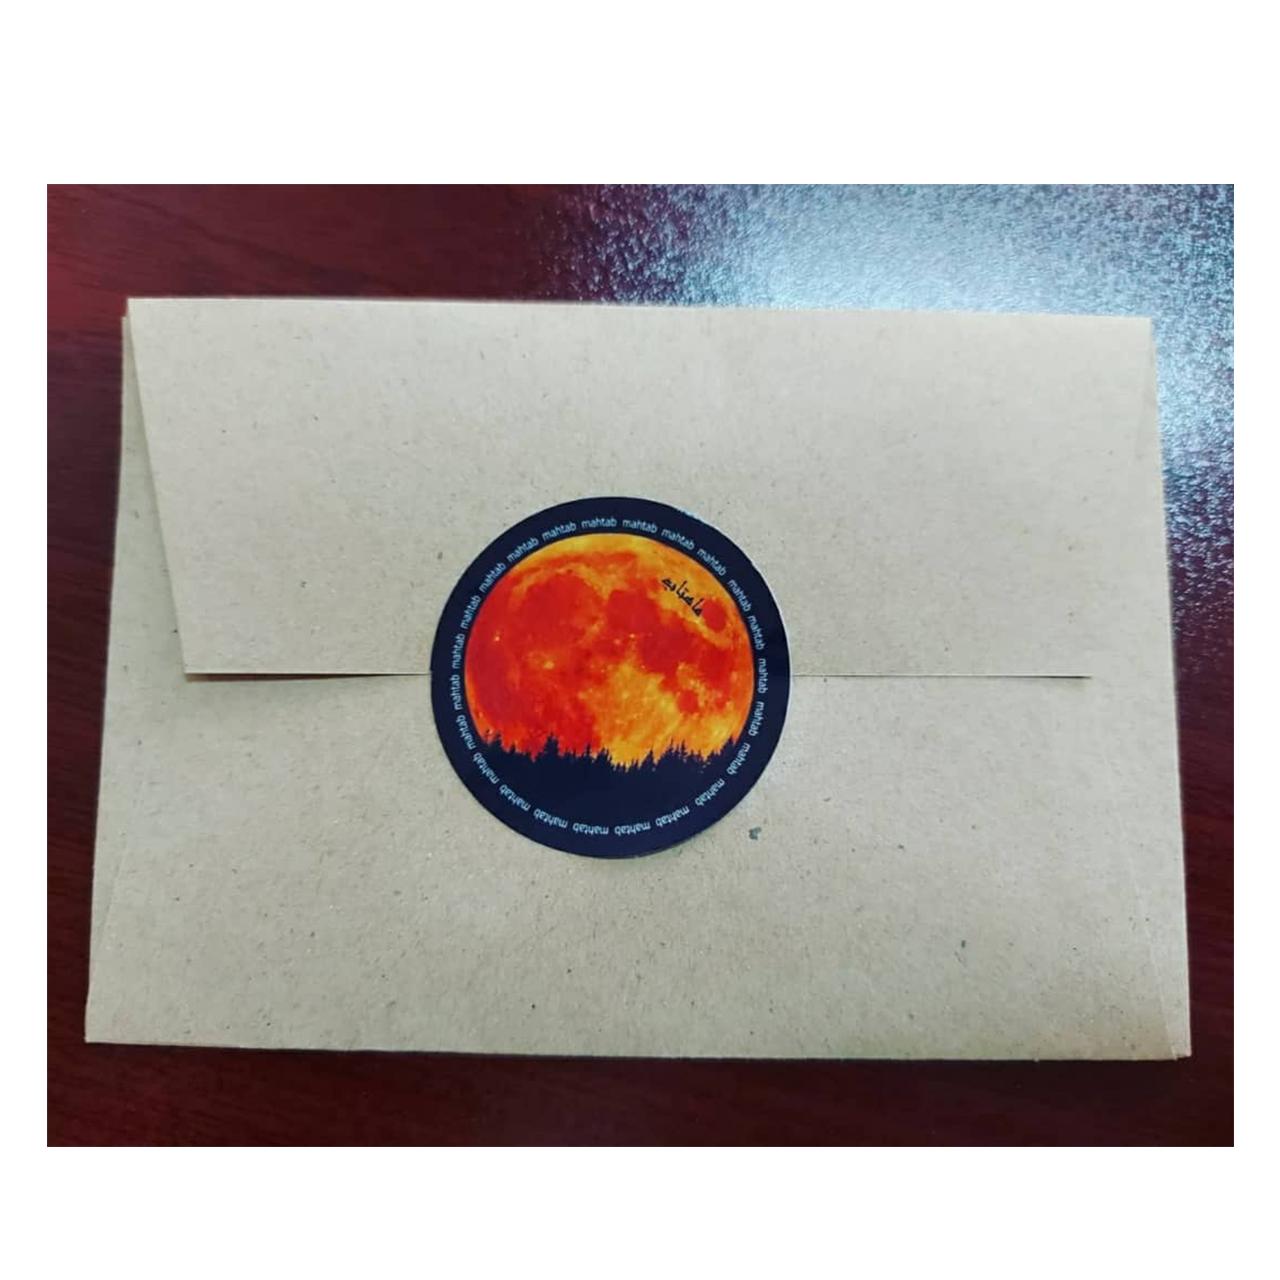 کارت پستال ماهتاب طرح پیوندتان مبارک کد 1913